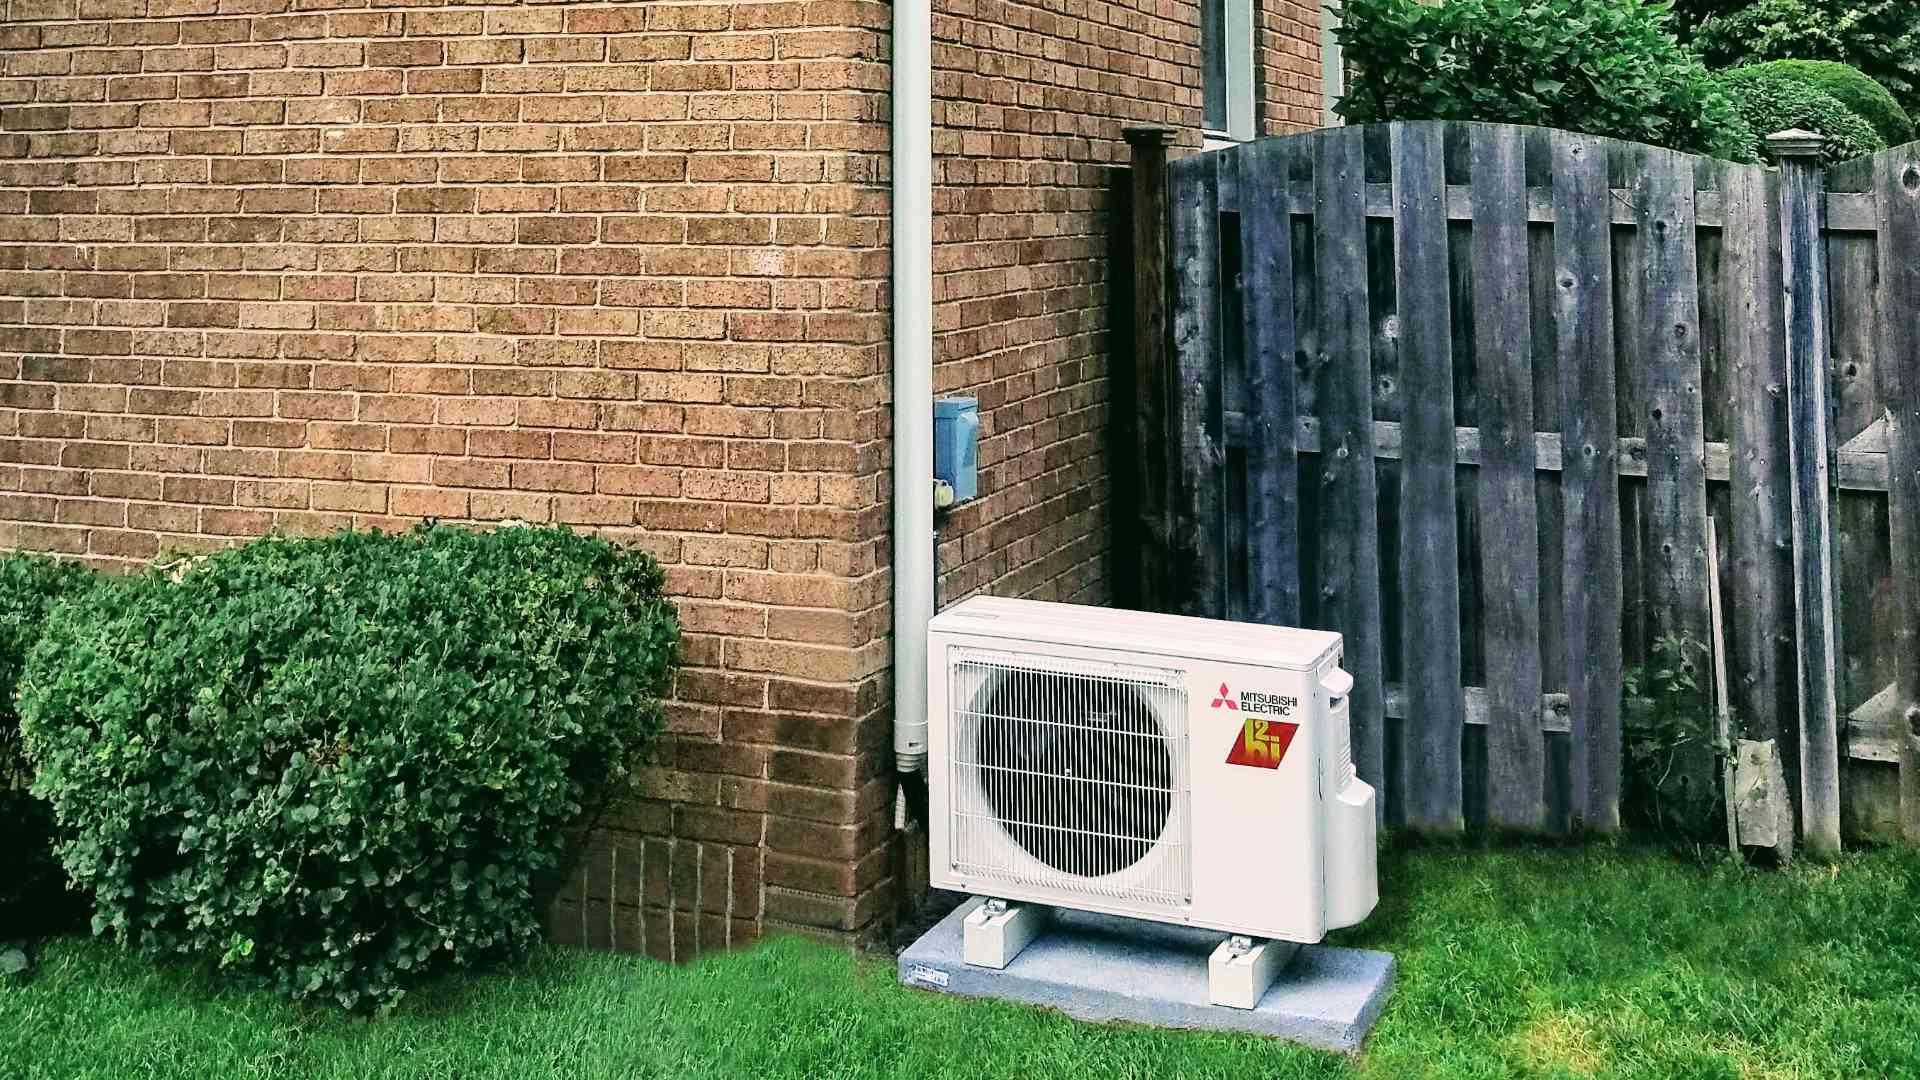 Mitsubishi Heat Pump Outside House